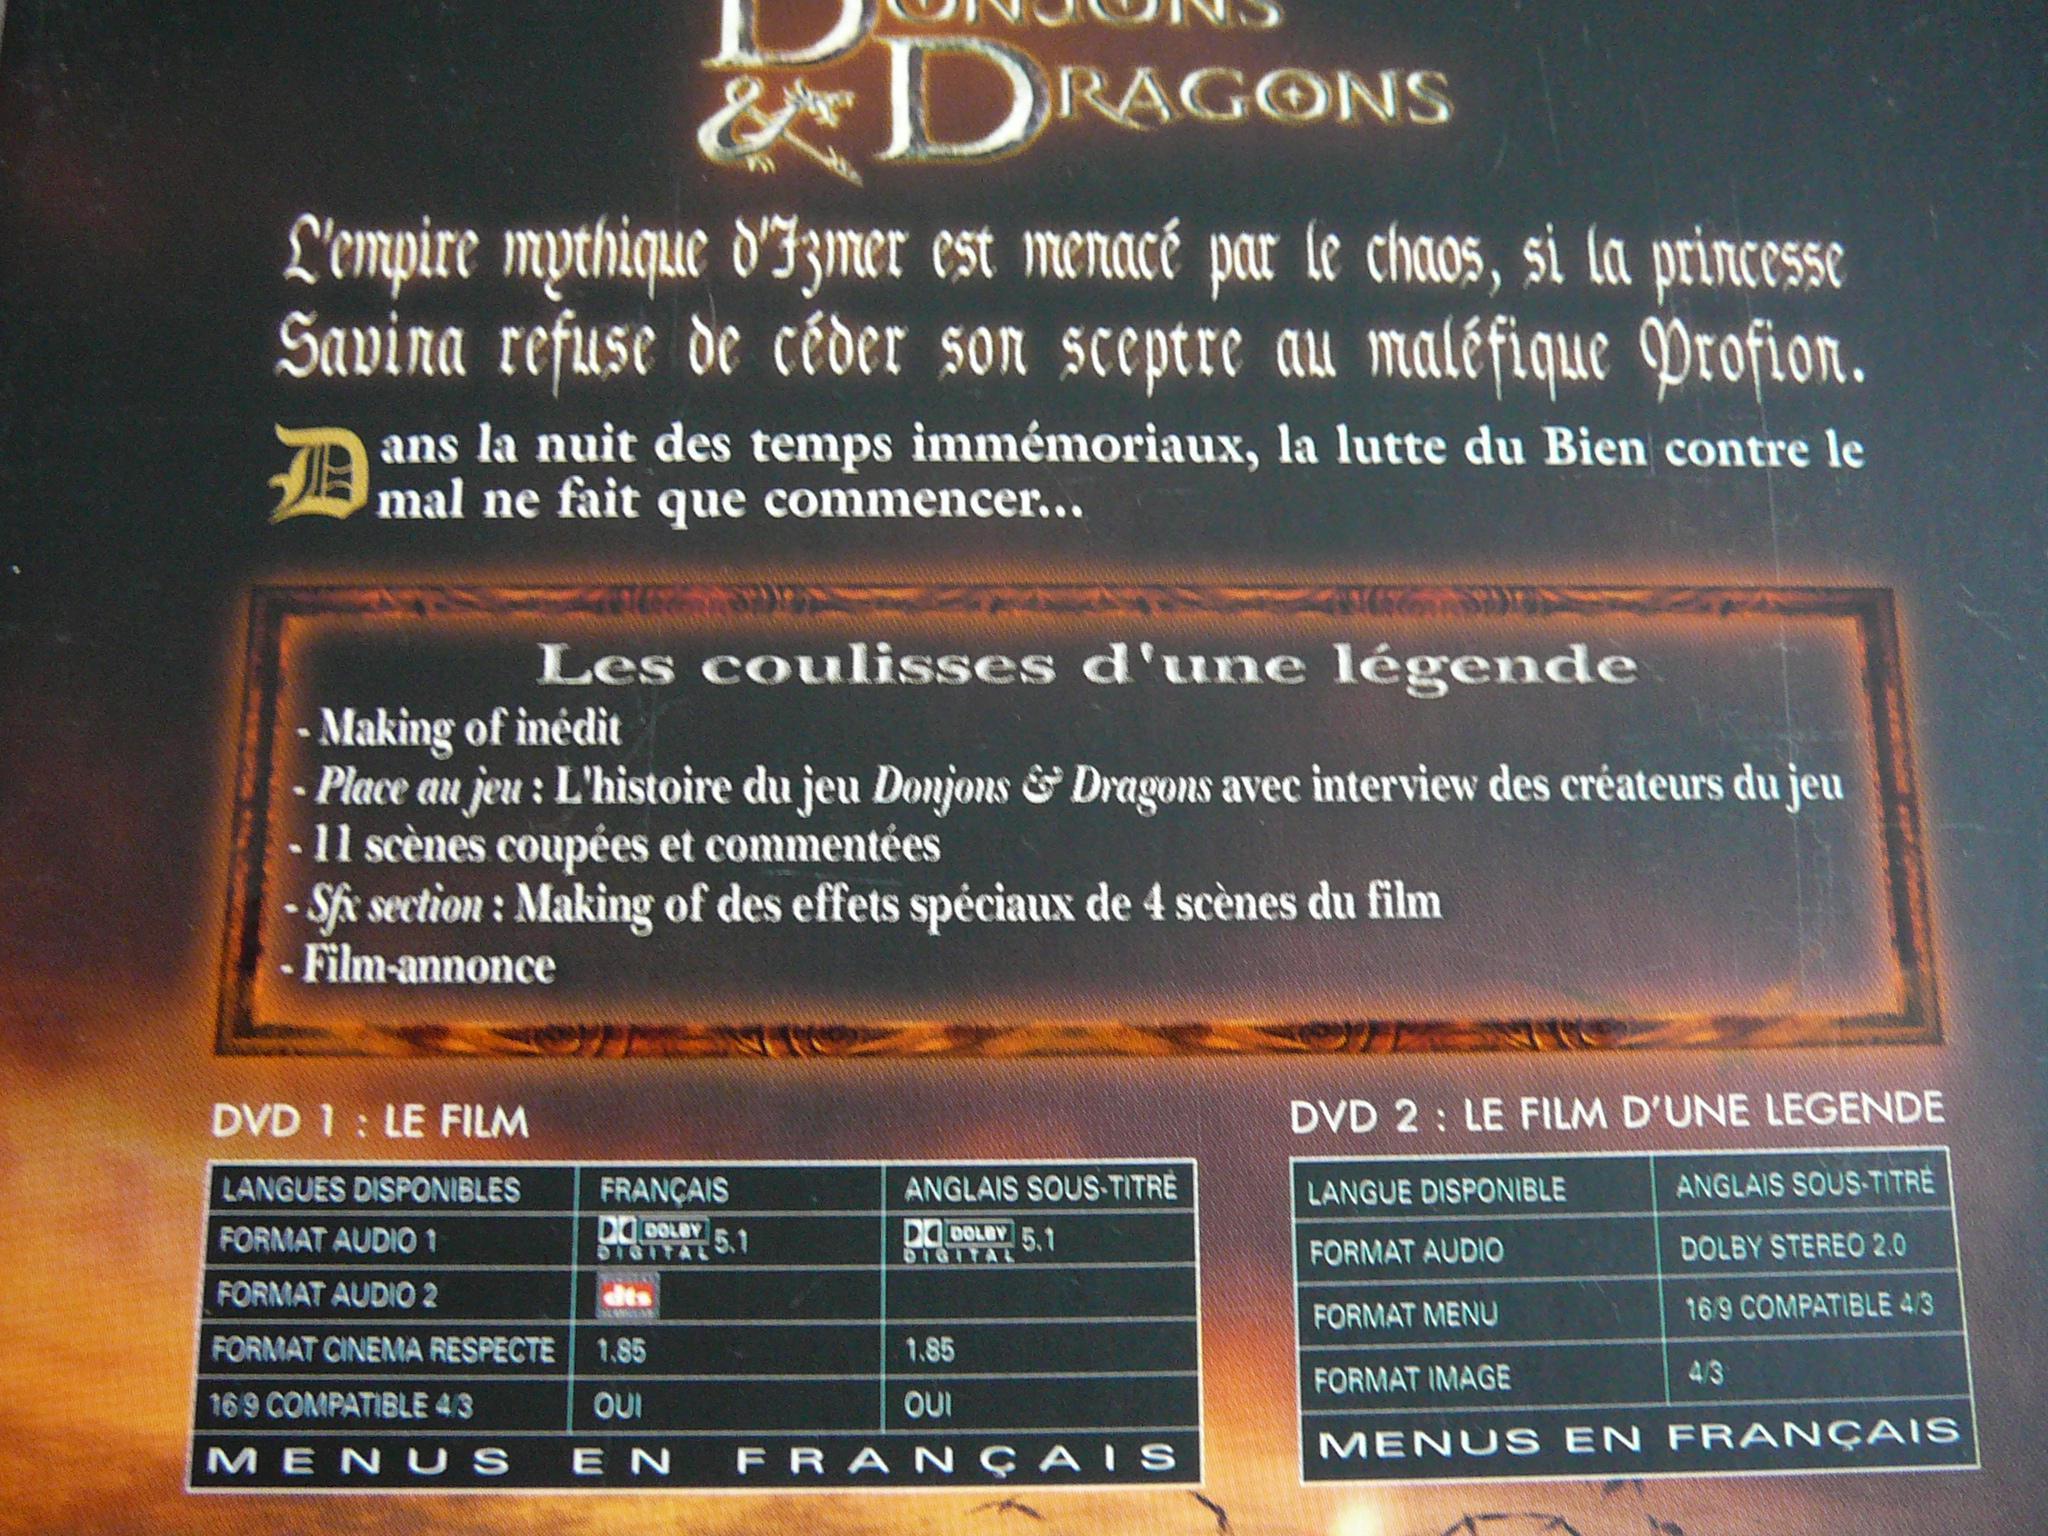 troc de troc dvd donjons & dragons image 2